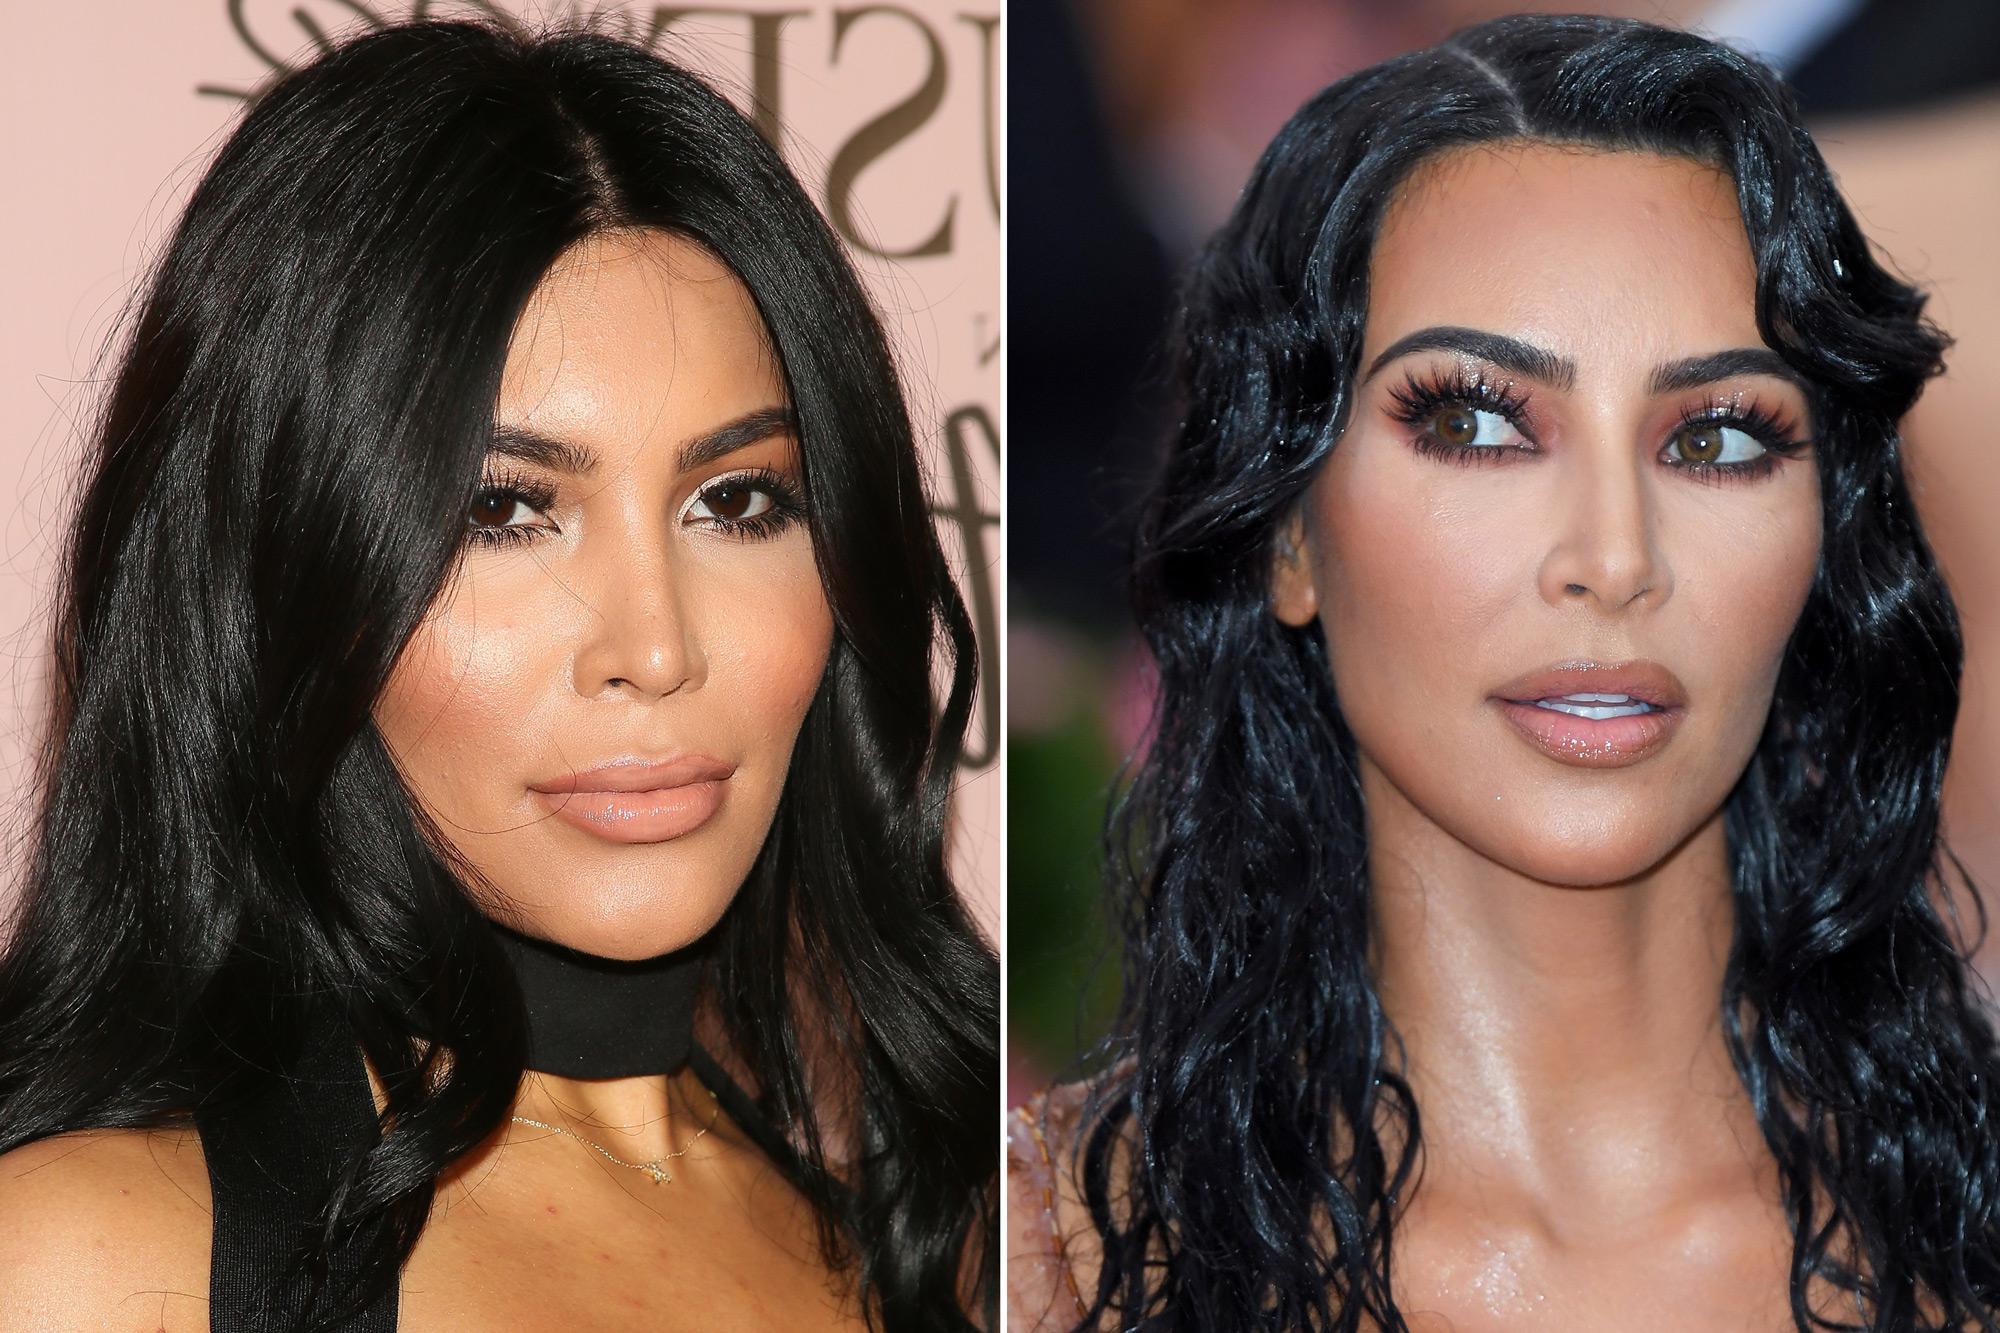 Kim Kardashian lookalike claims star stole her look